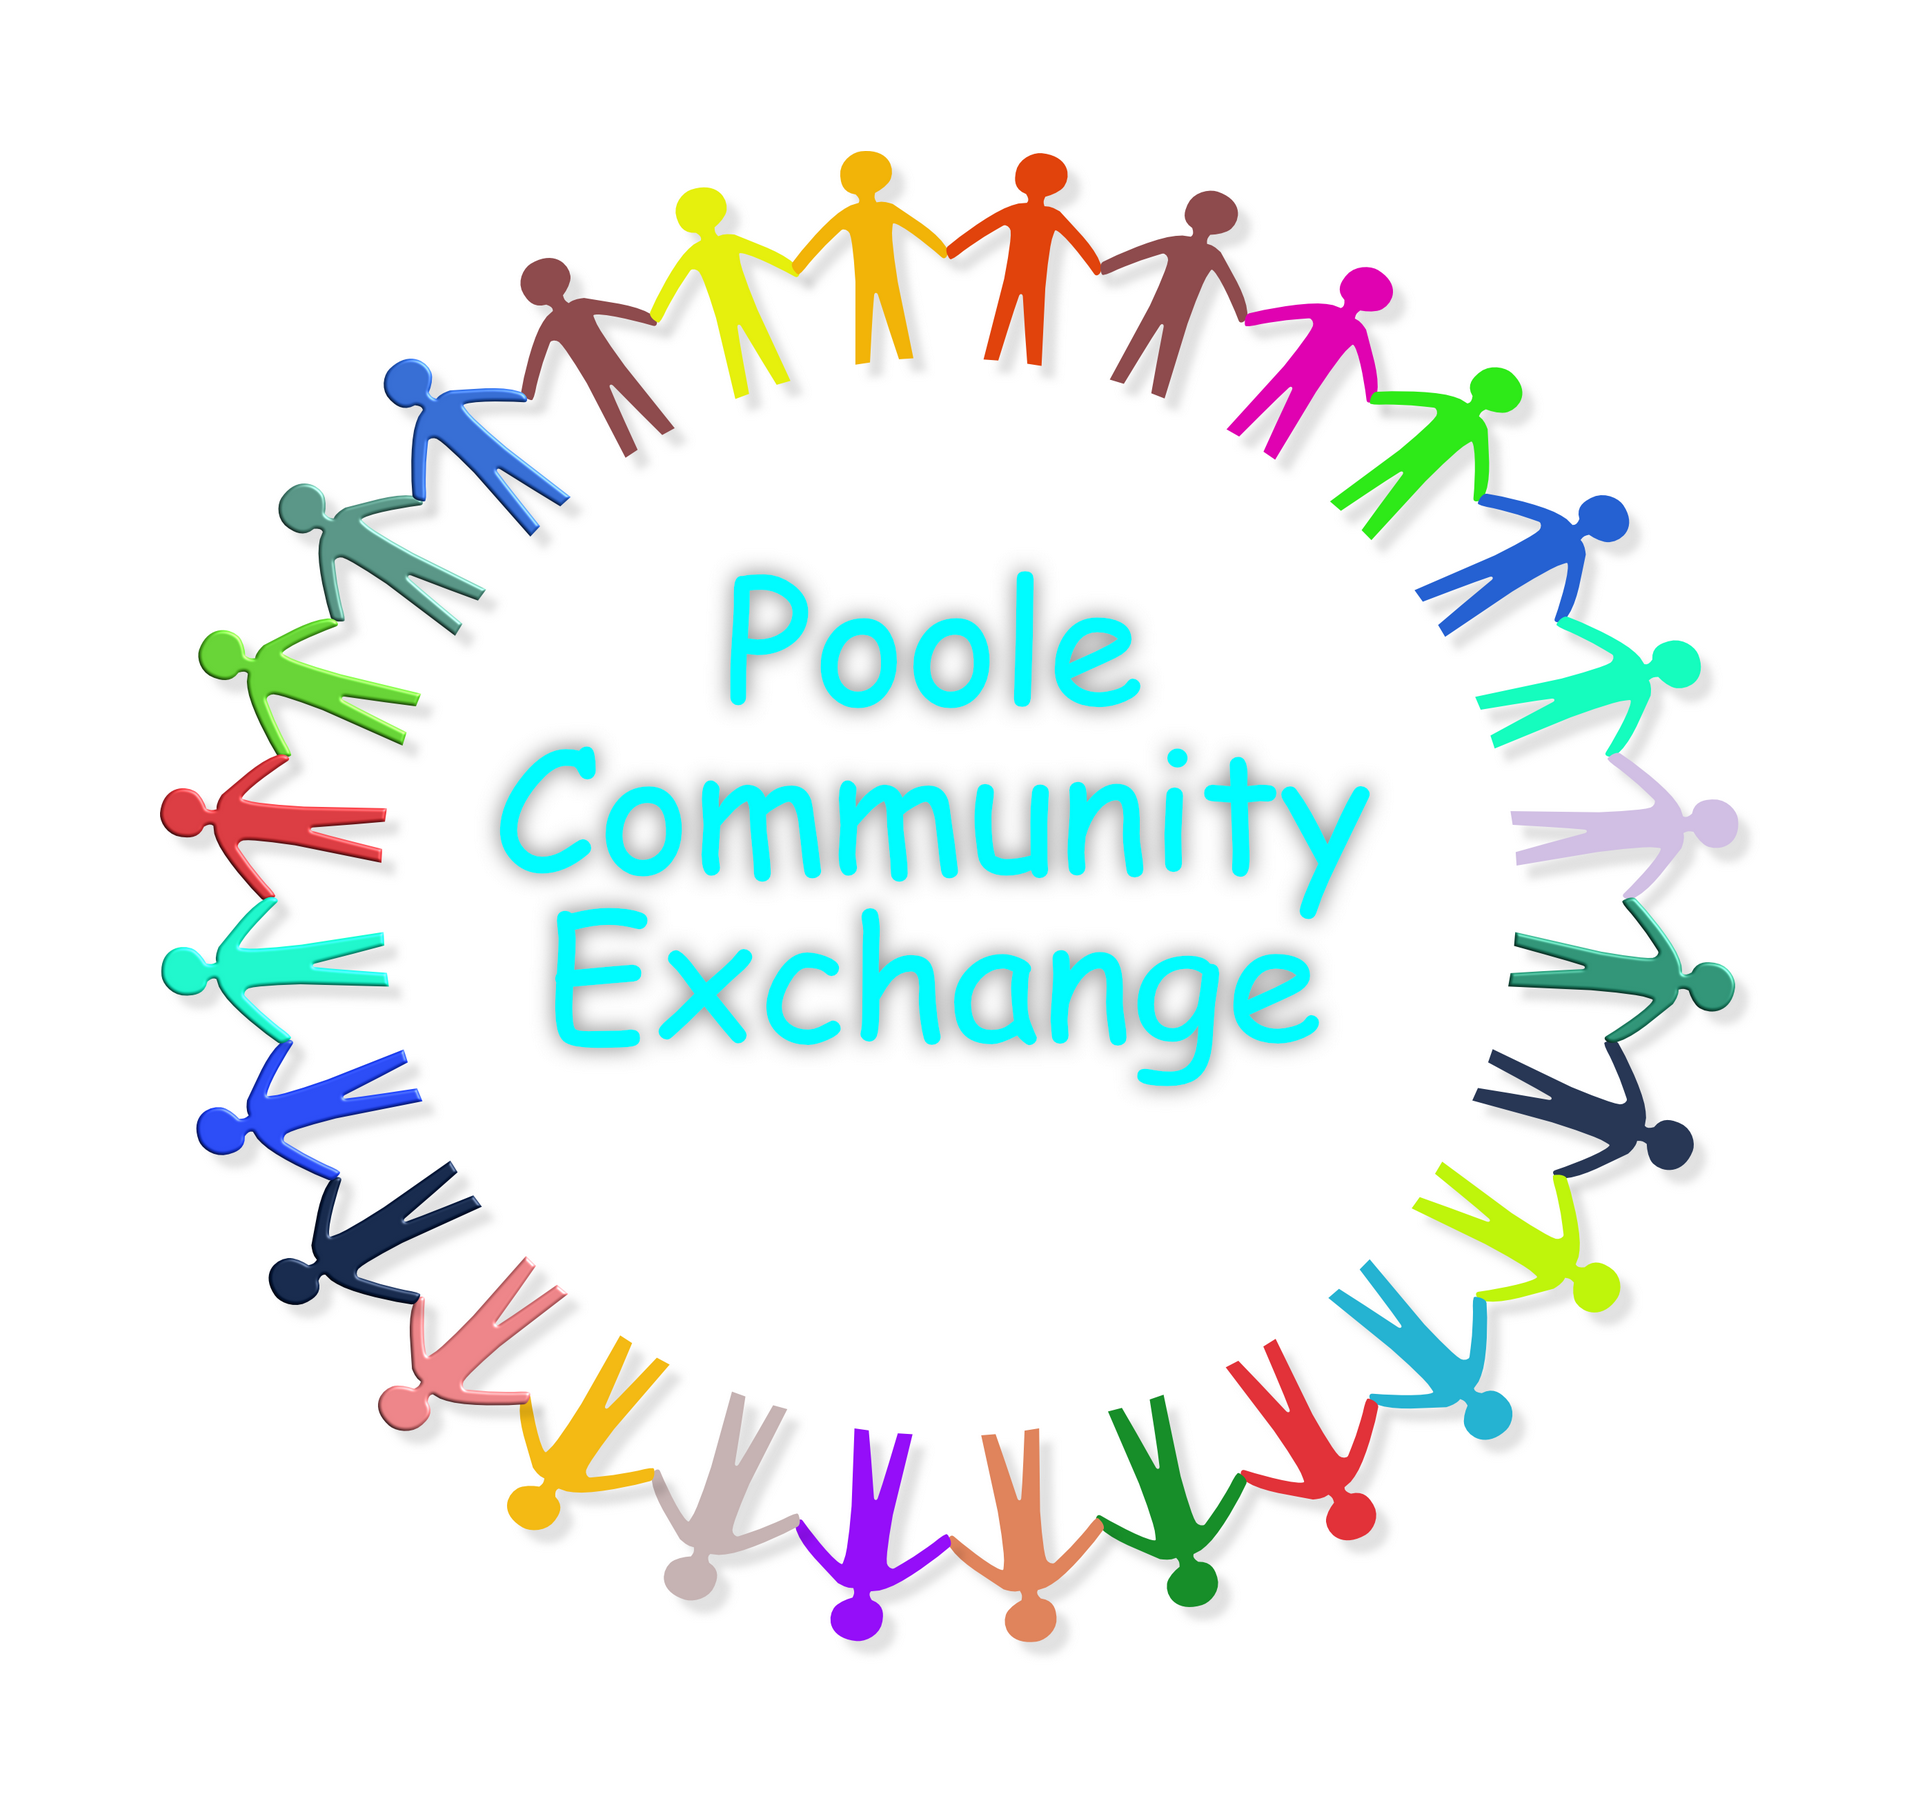 Poole Community Exchange